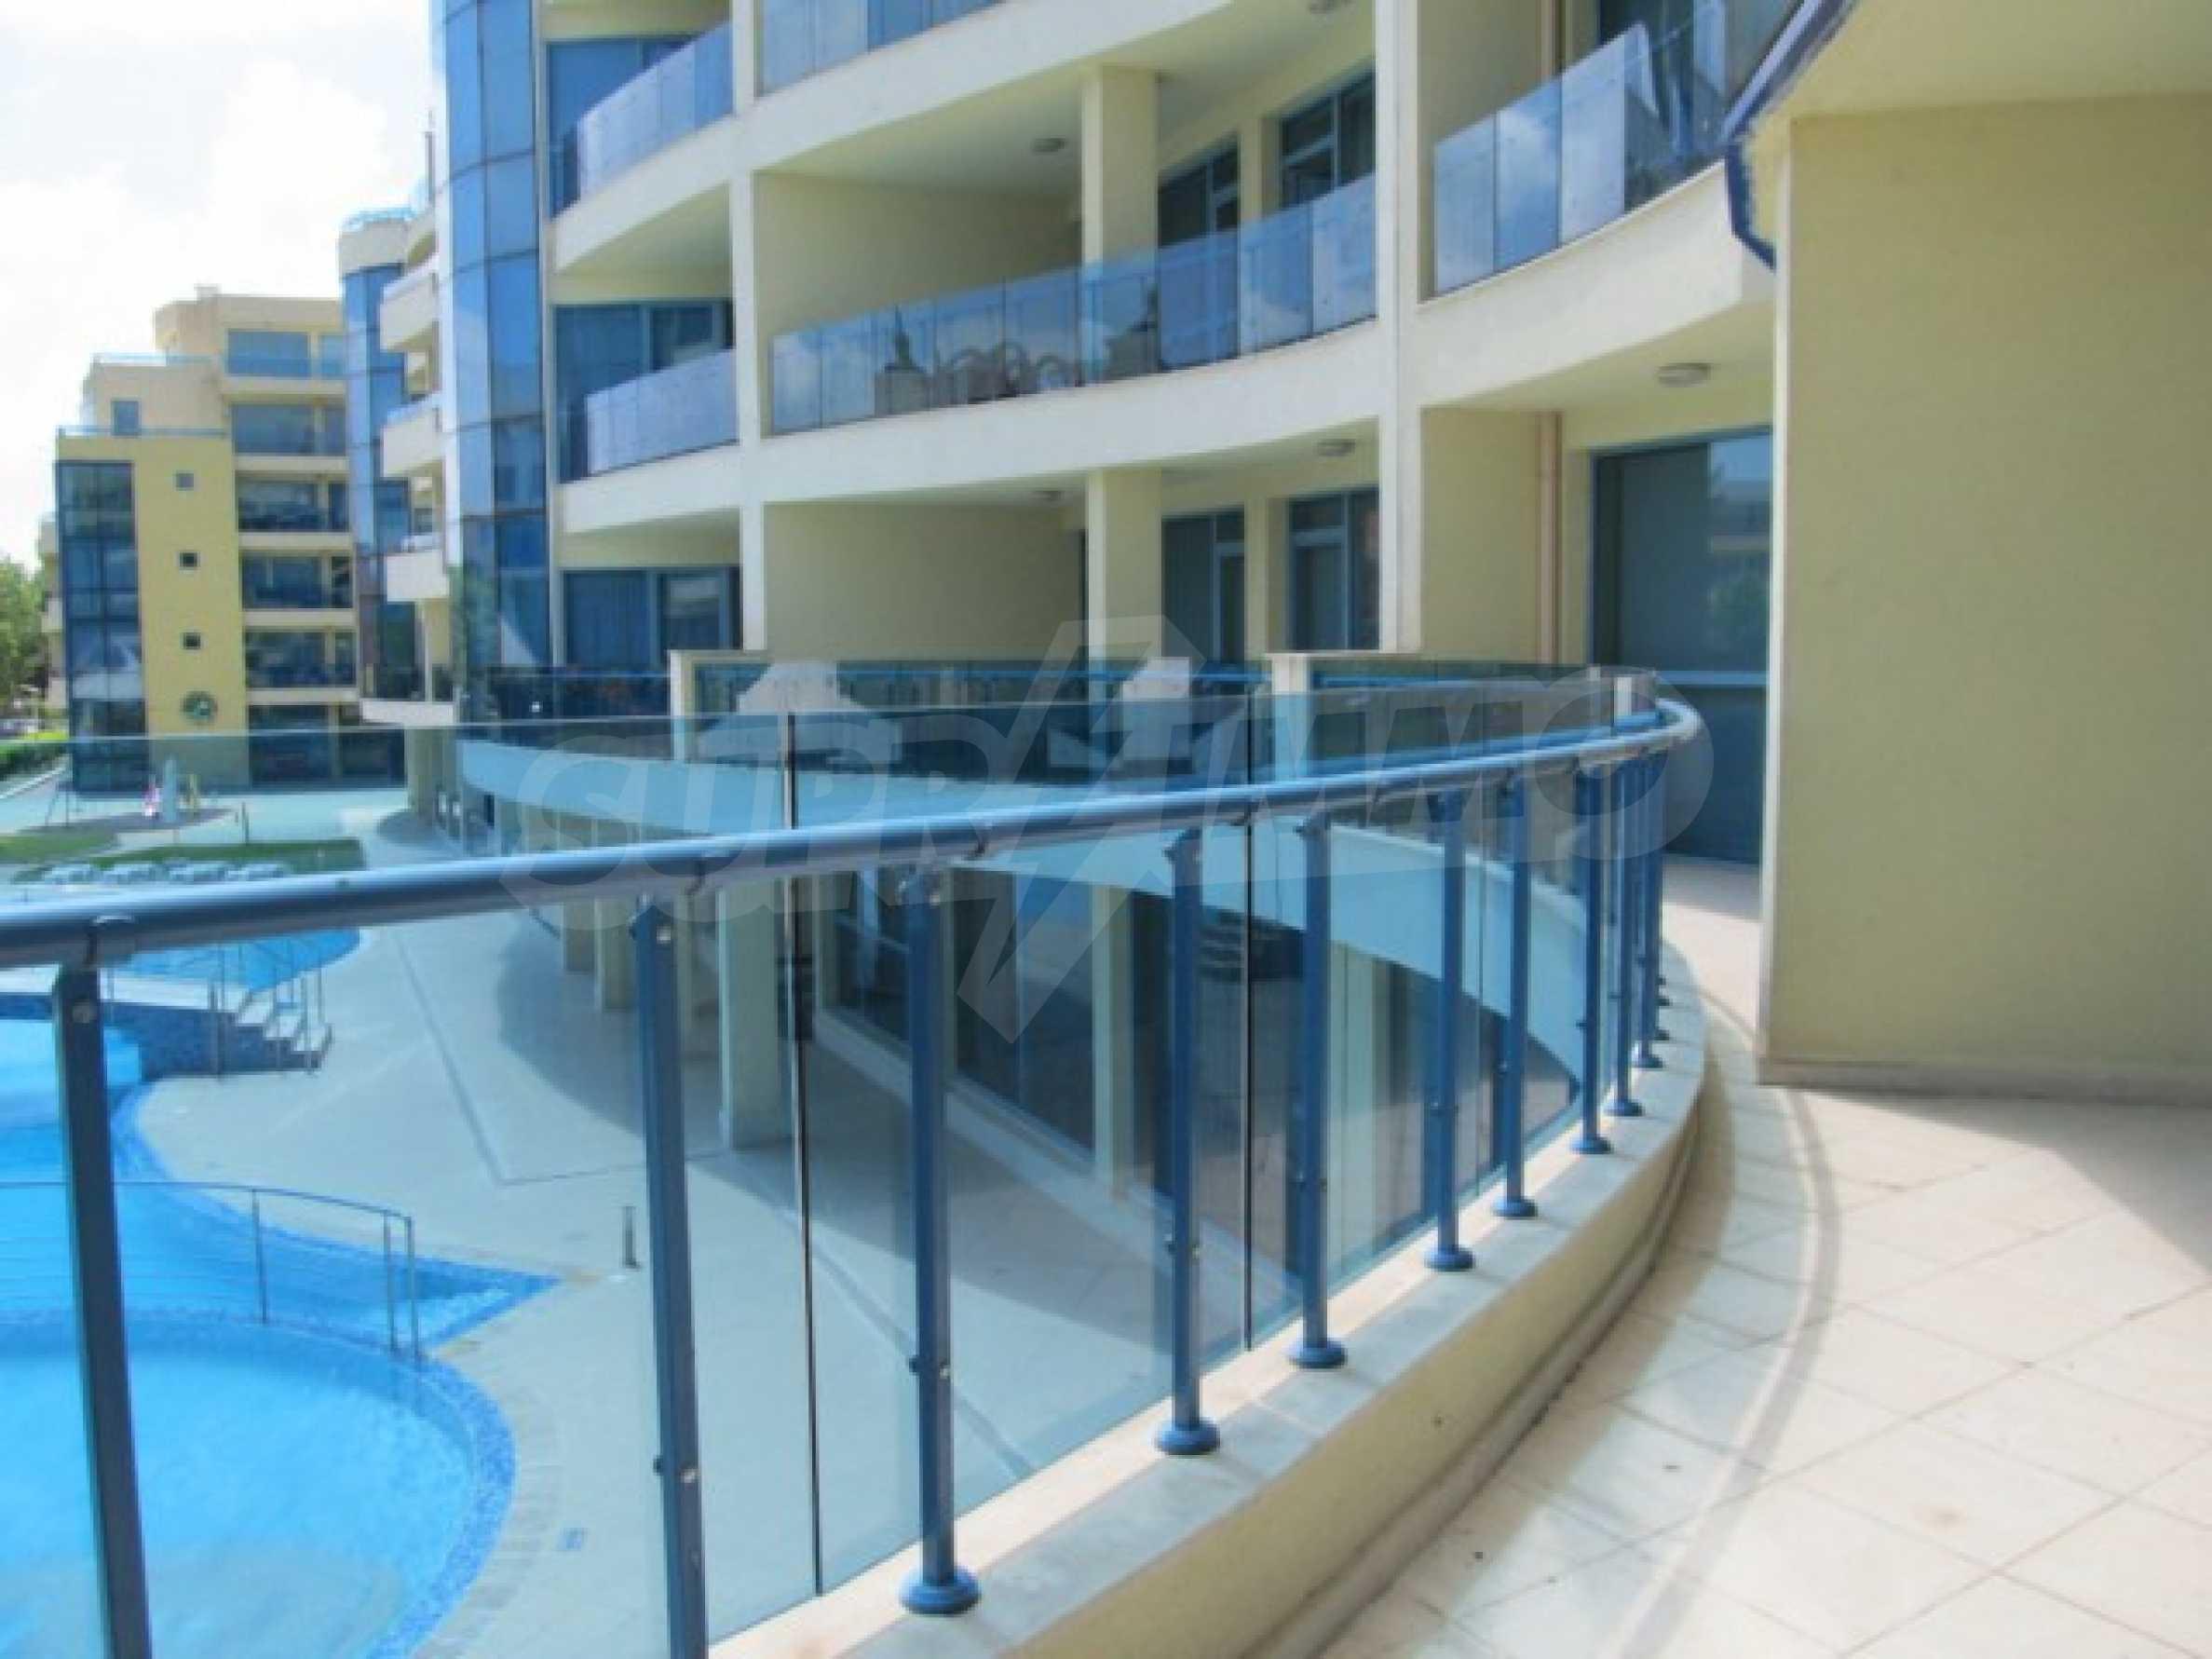 Тристаен апартамент за продажба в Поморие 23